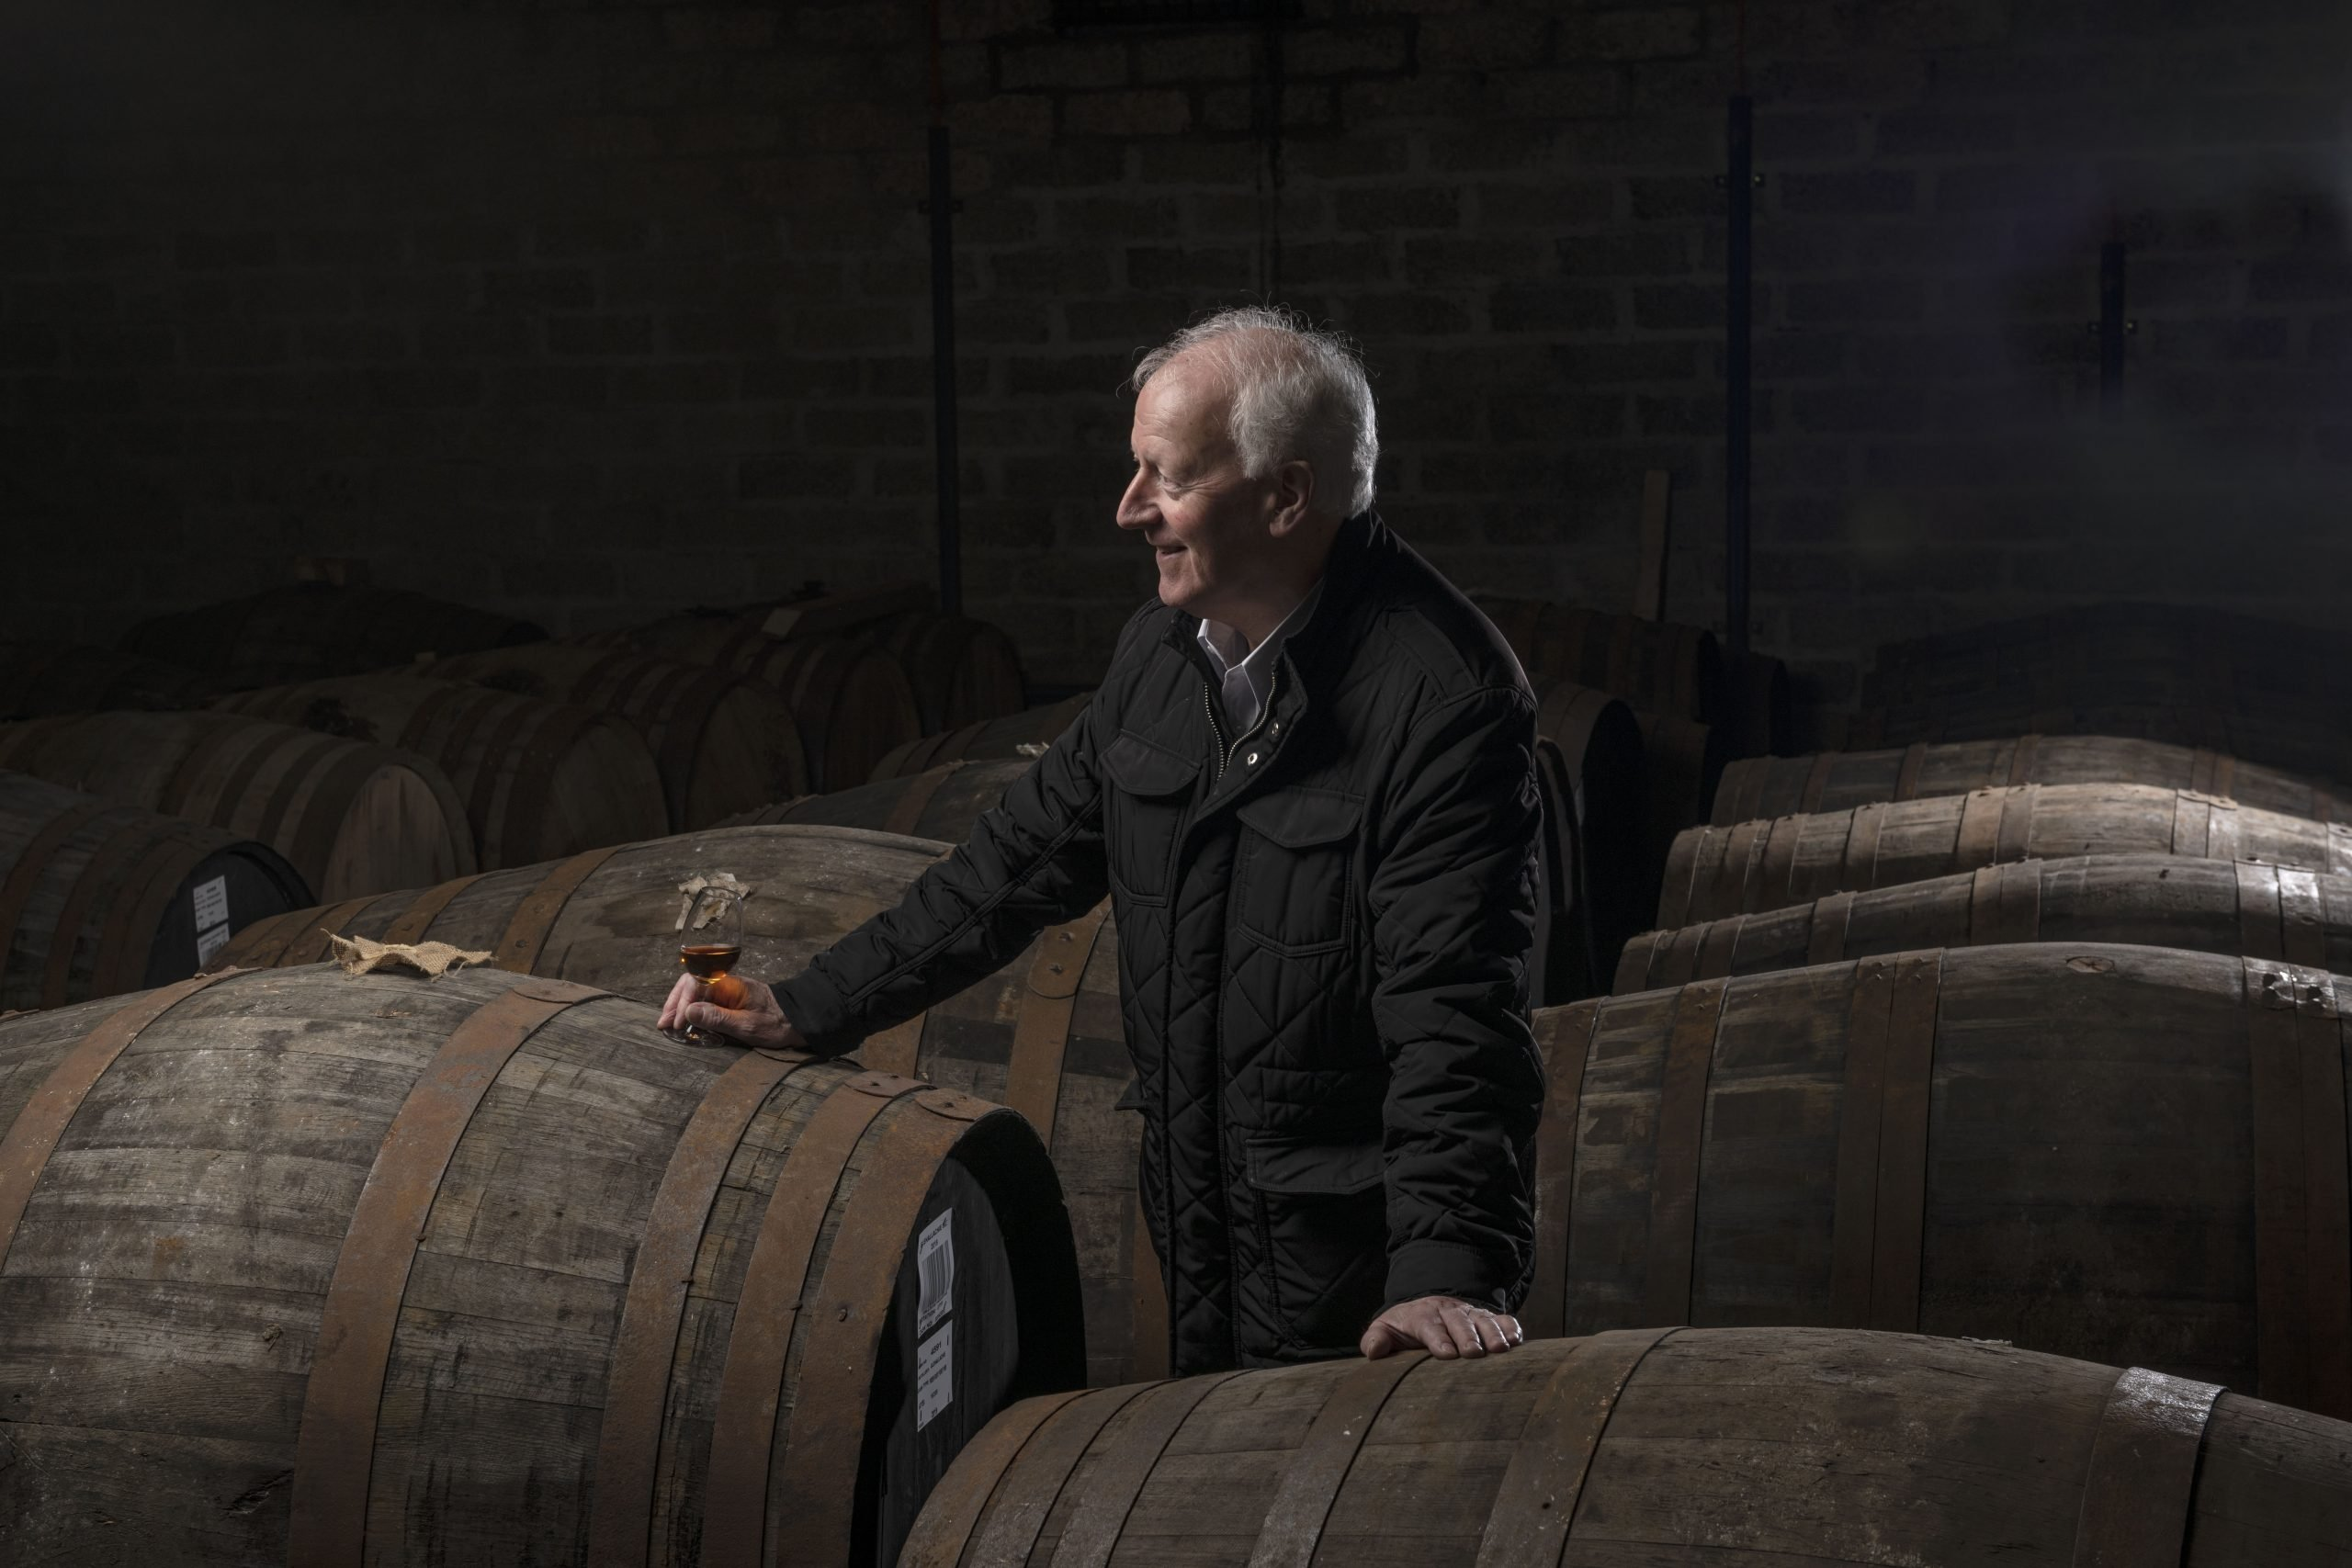 The GlenAllachie Distillery Billy Walker